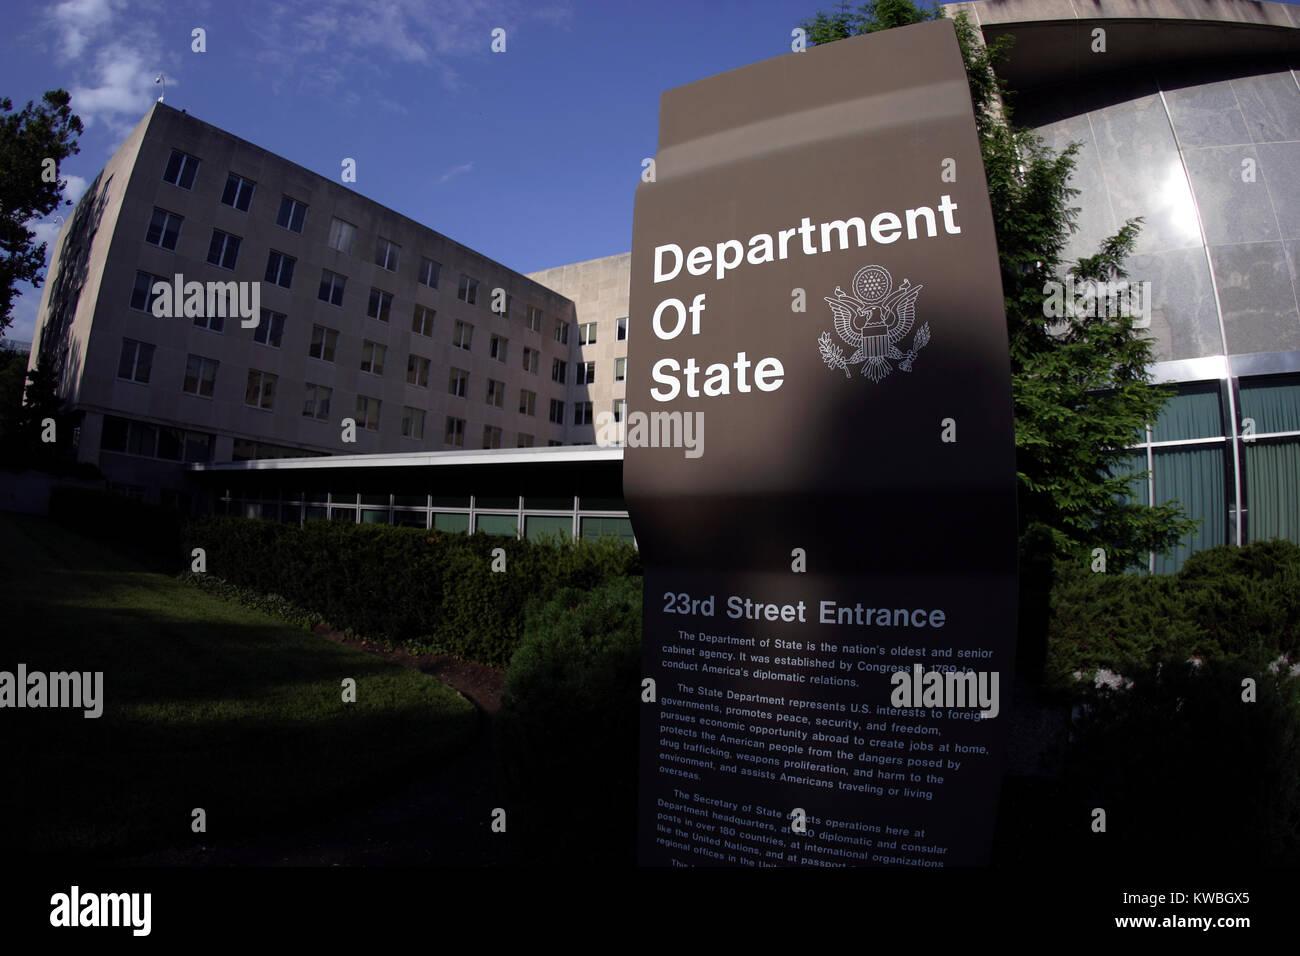 State Department Building, Washington, D.C. Stock Photo